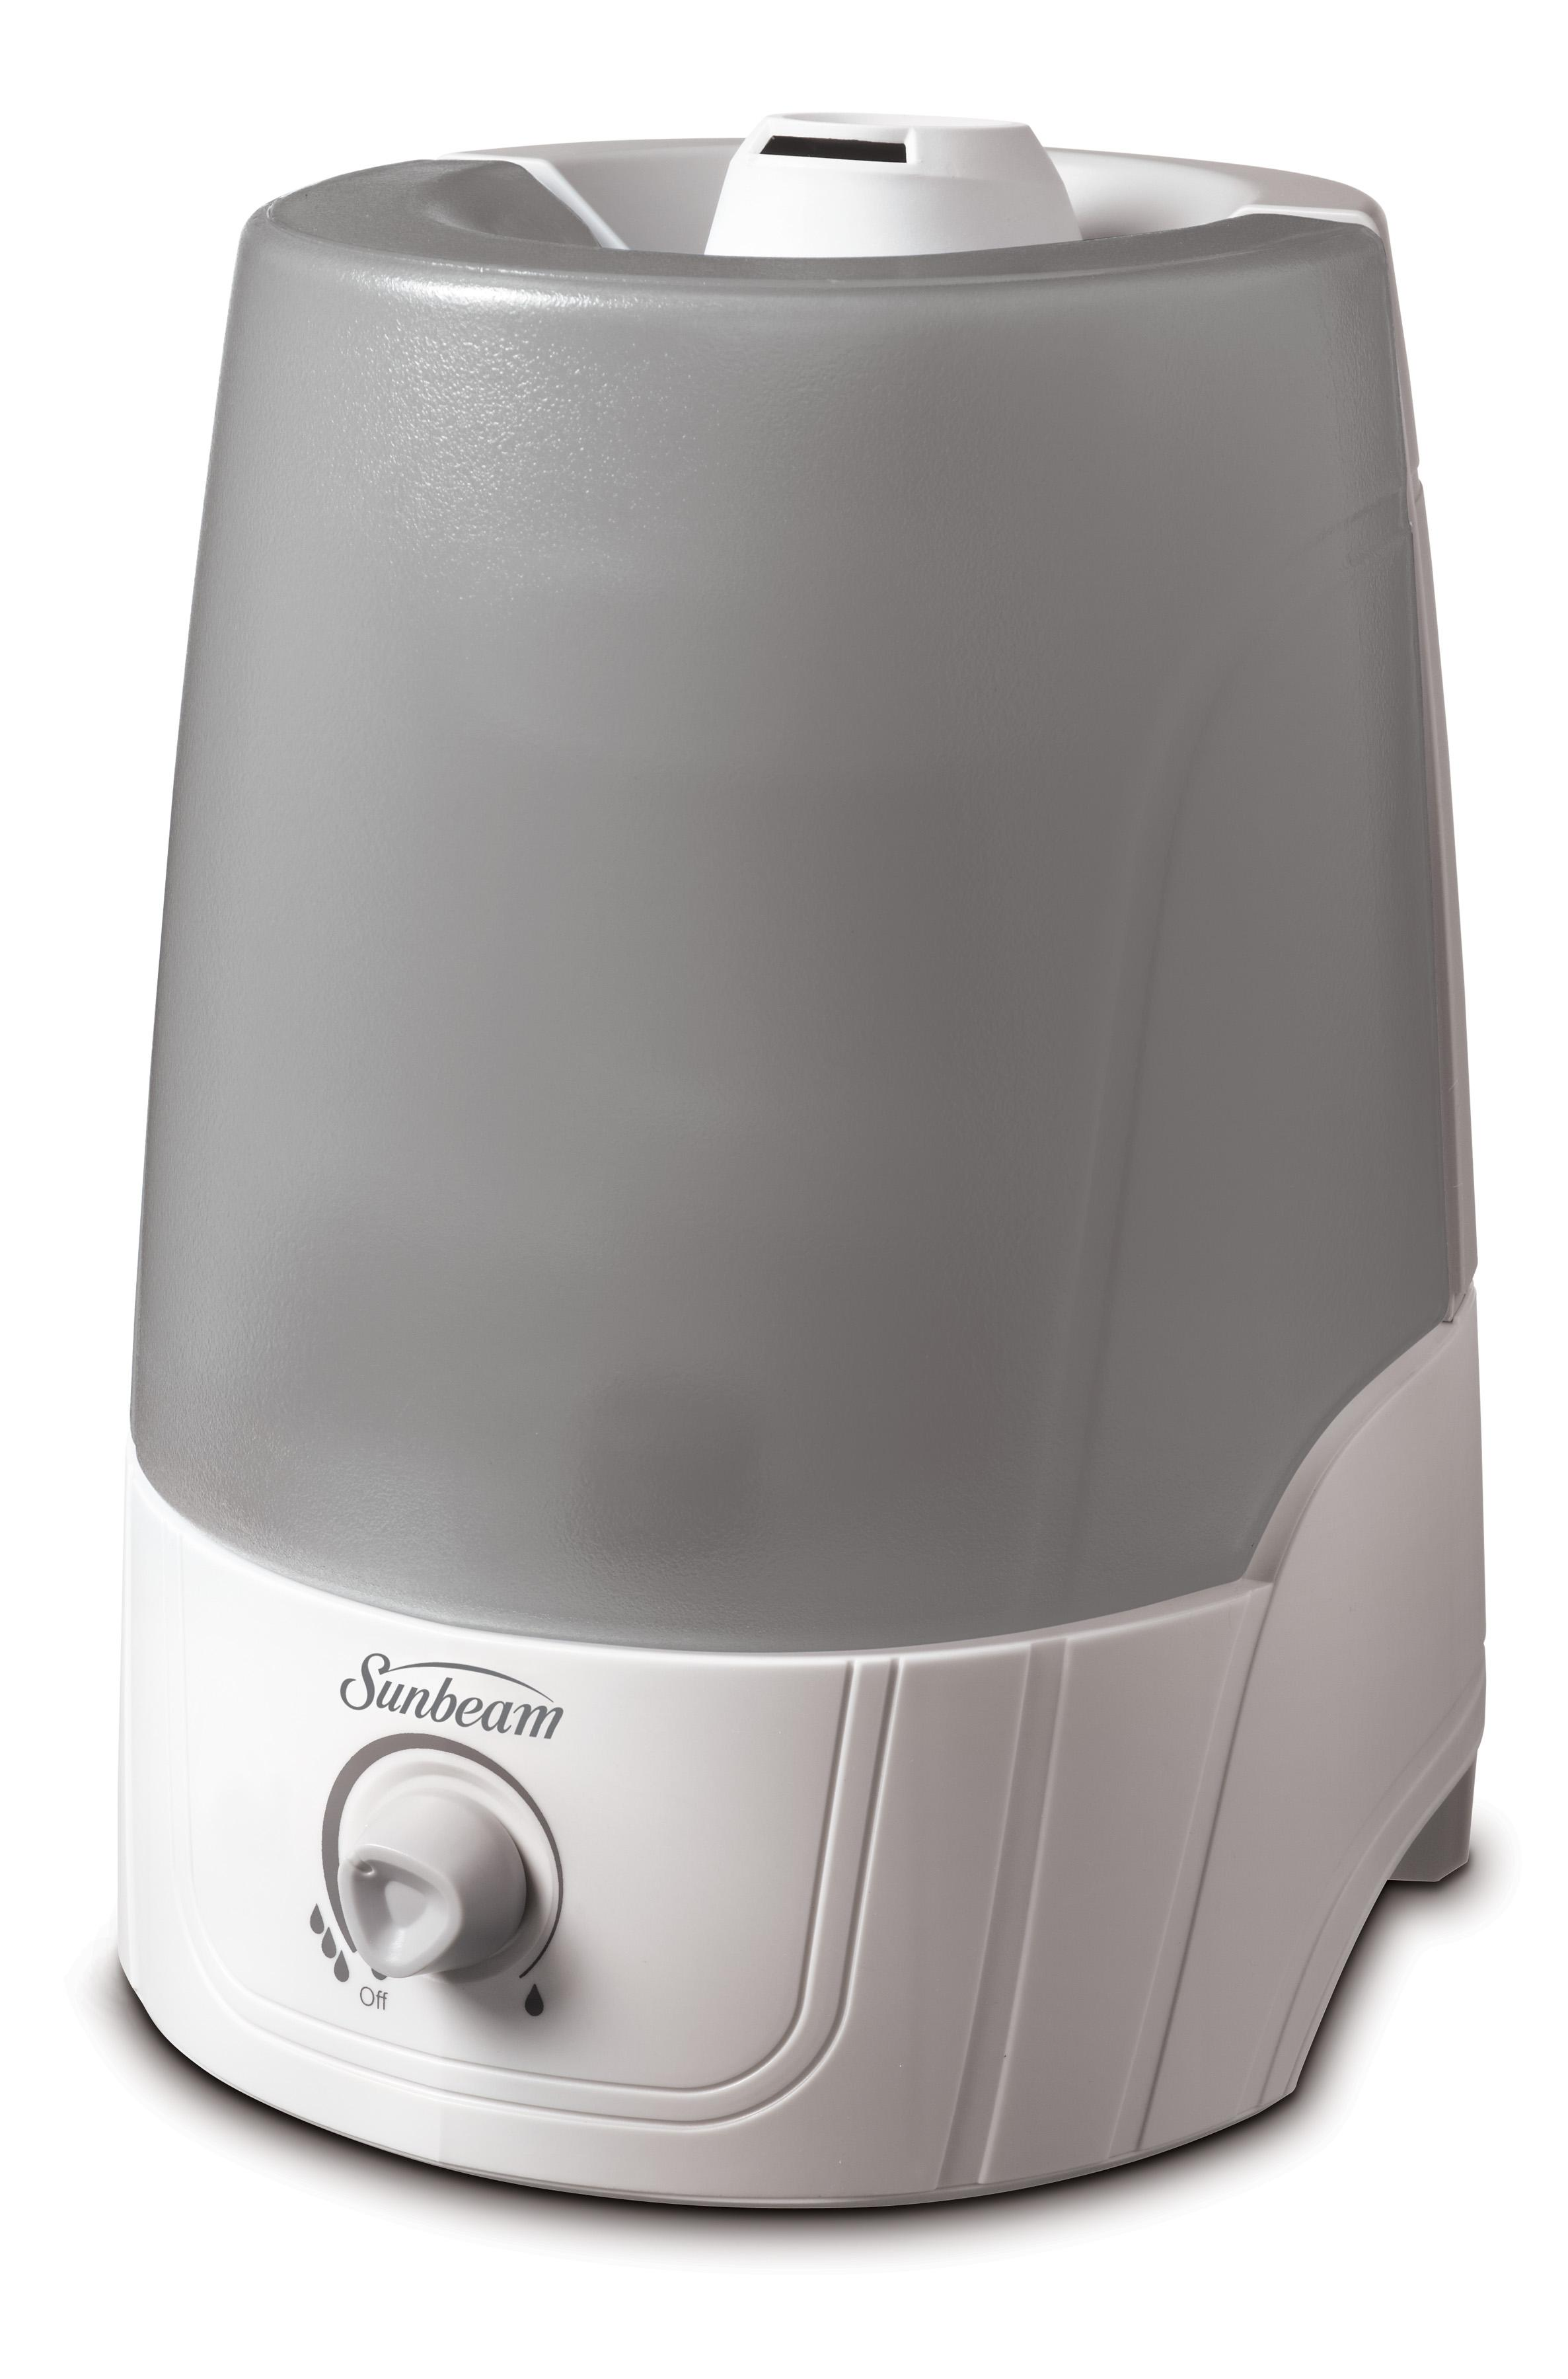 Sunbeam Ultrasonic Humidifier Amazon Home & Kitchen